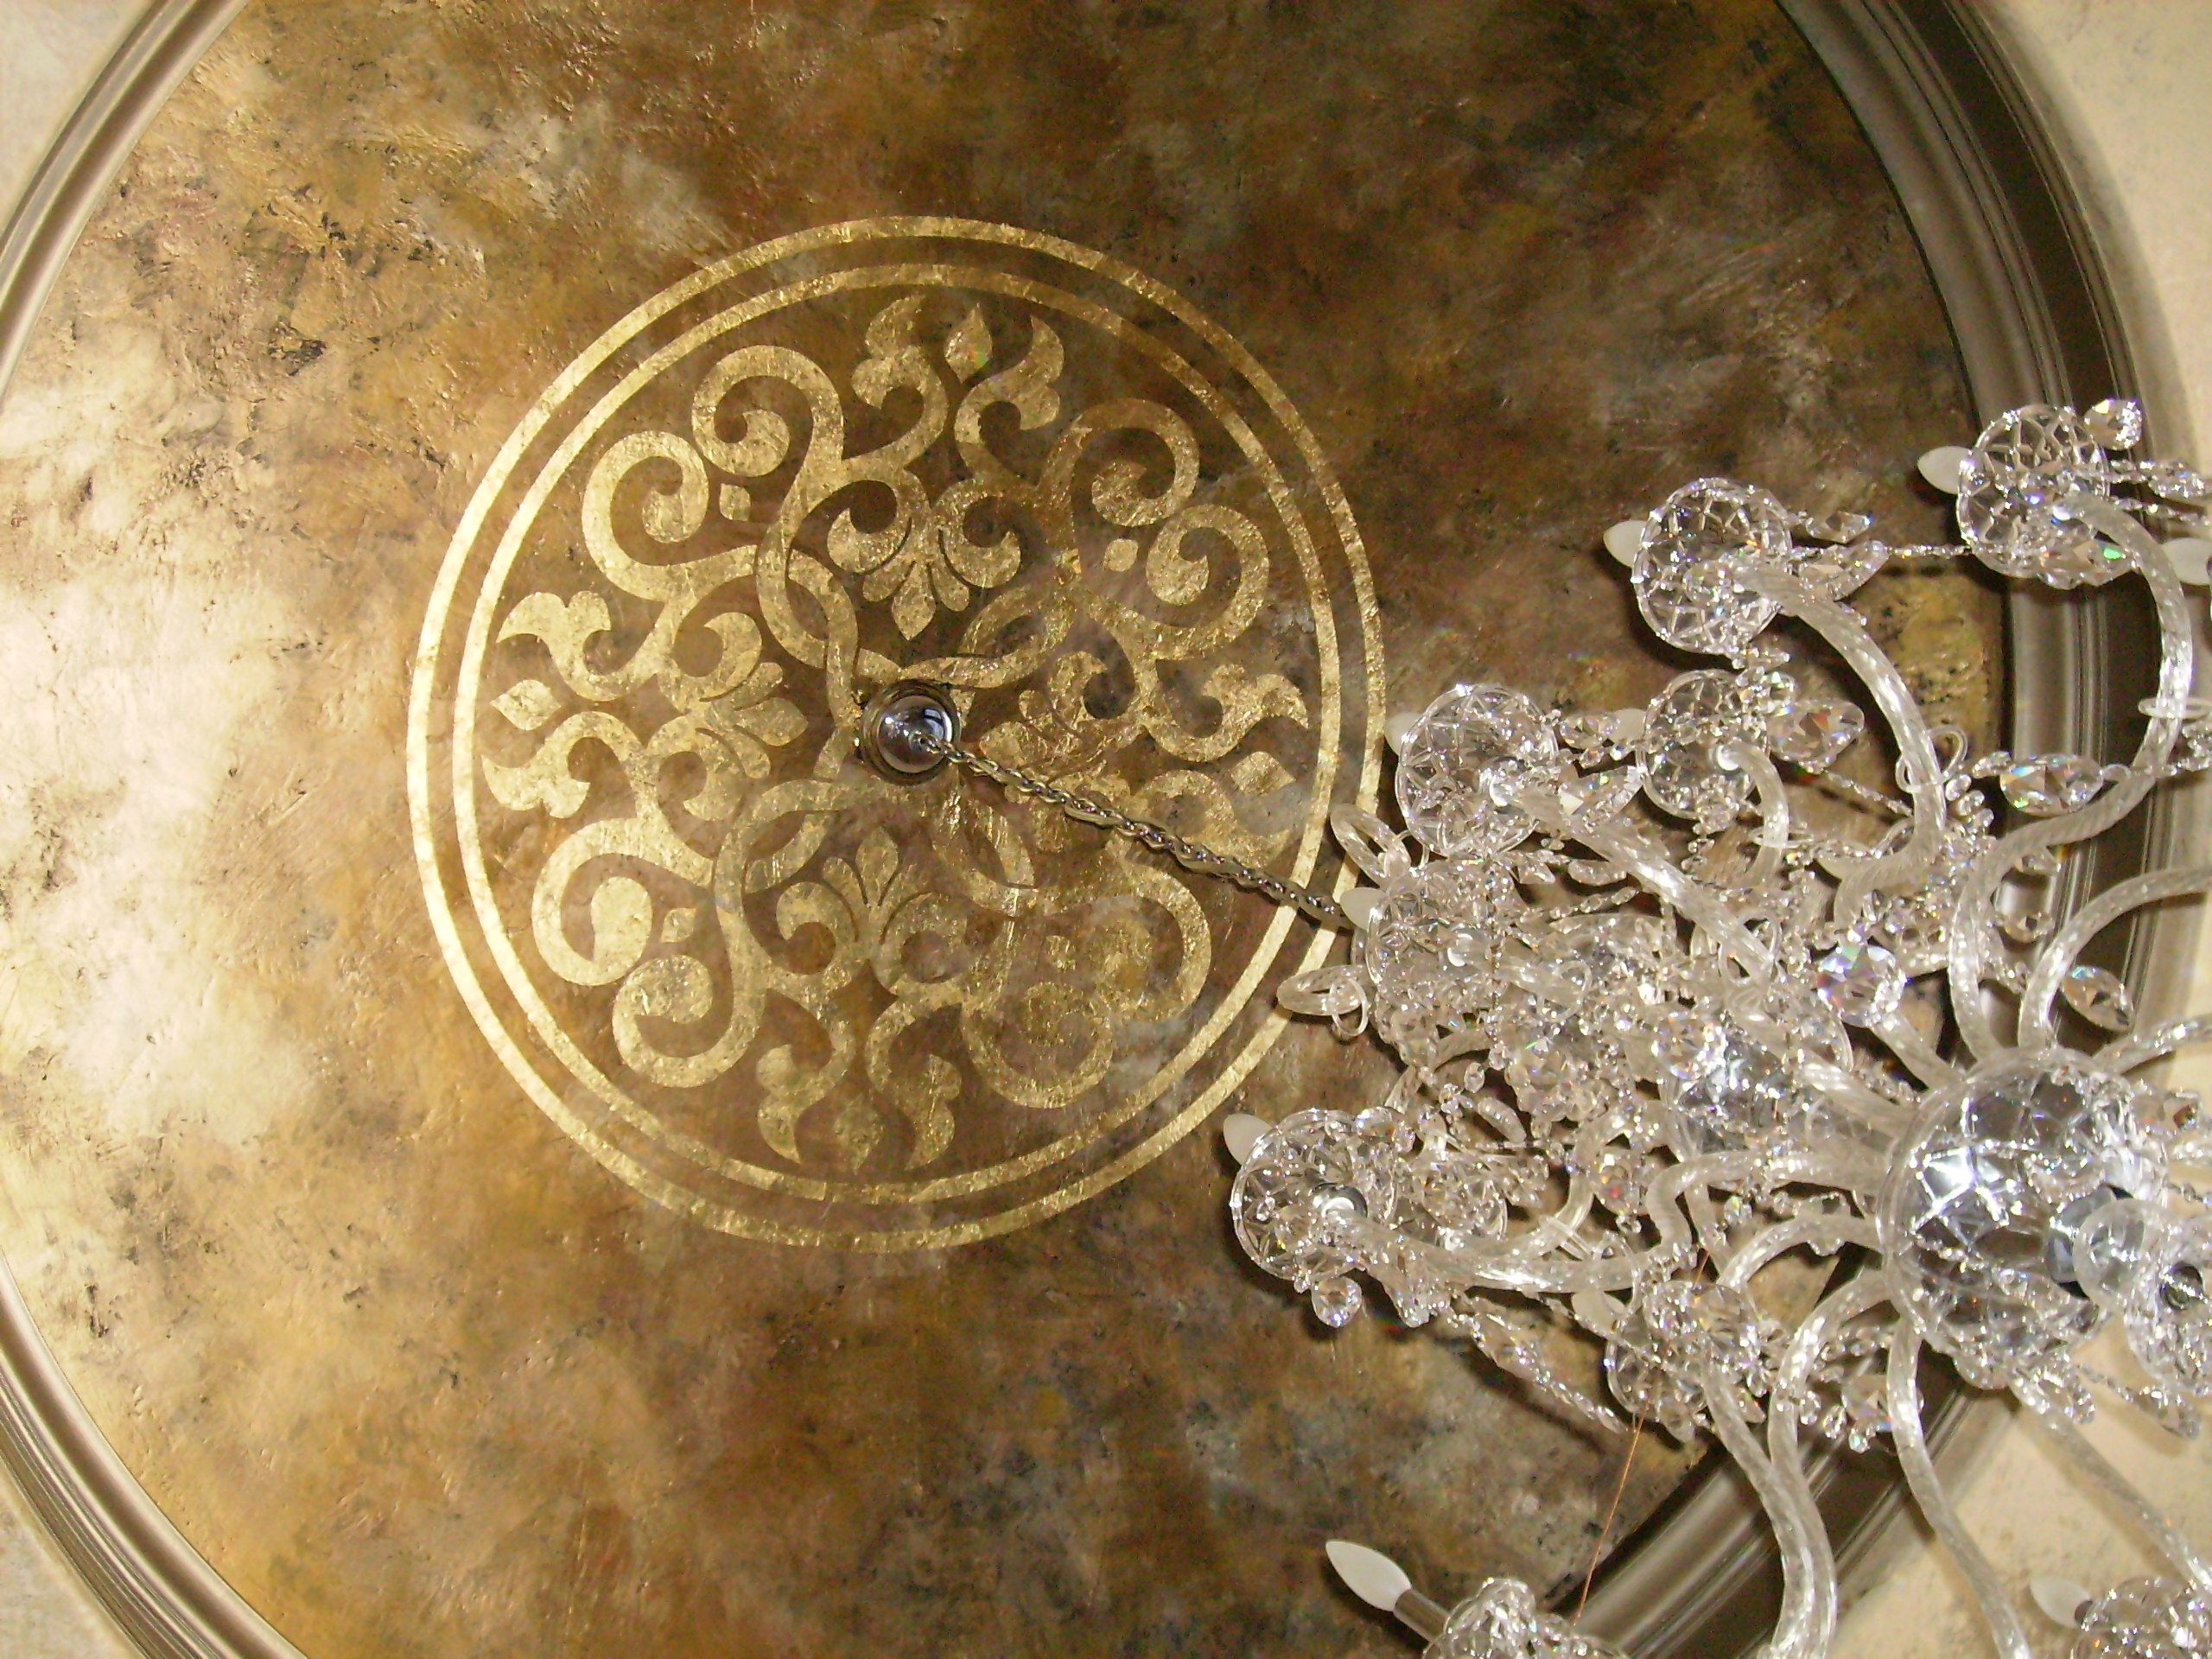 Decorative Finishes Studio Metallic Wax Dome Gold Leaf Modello With A Coordinating Metallic